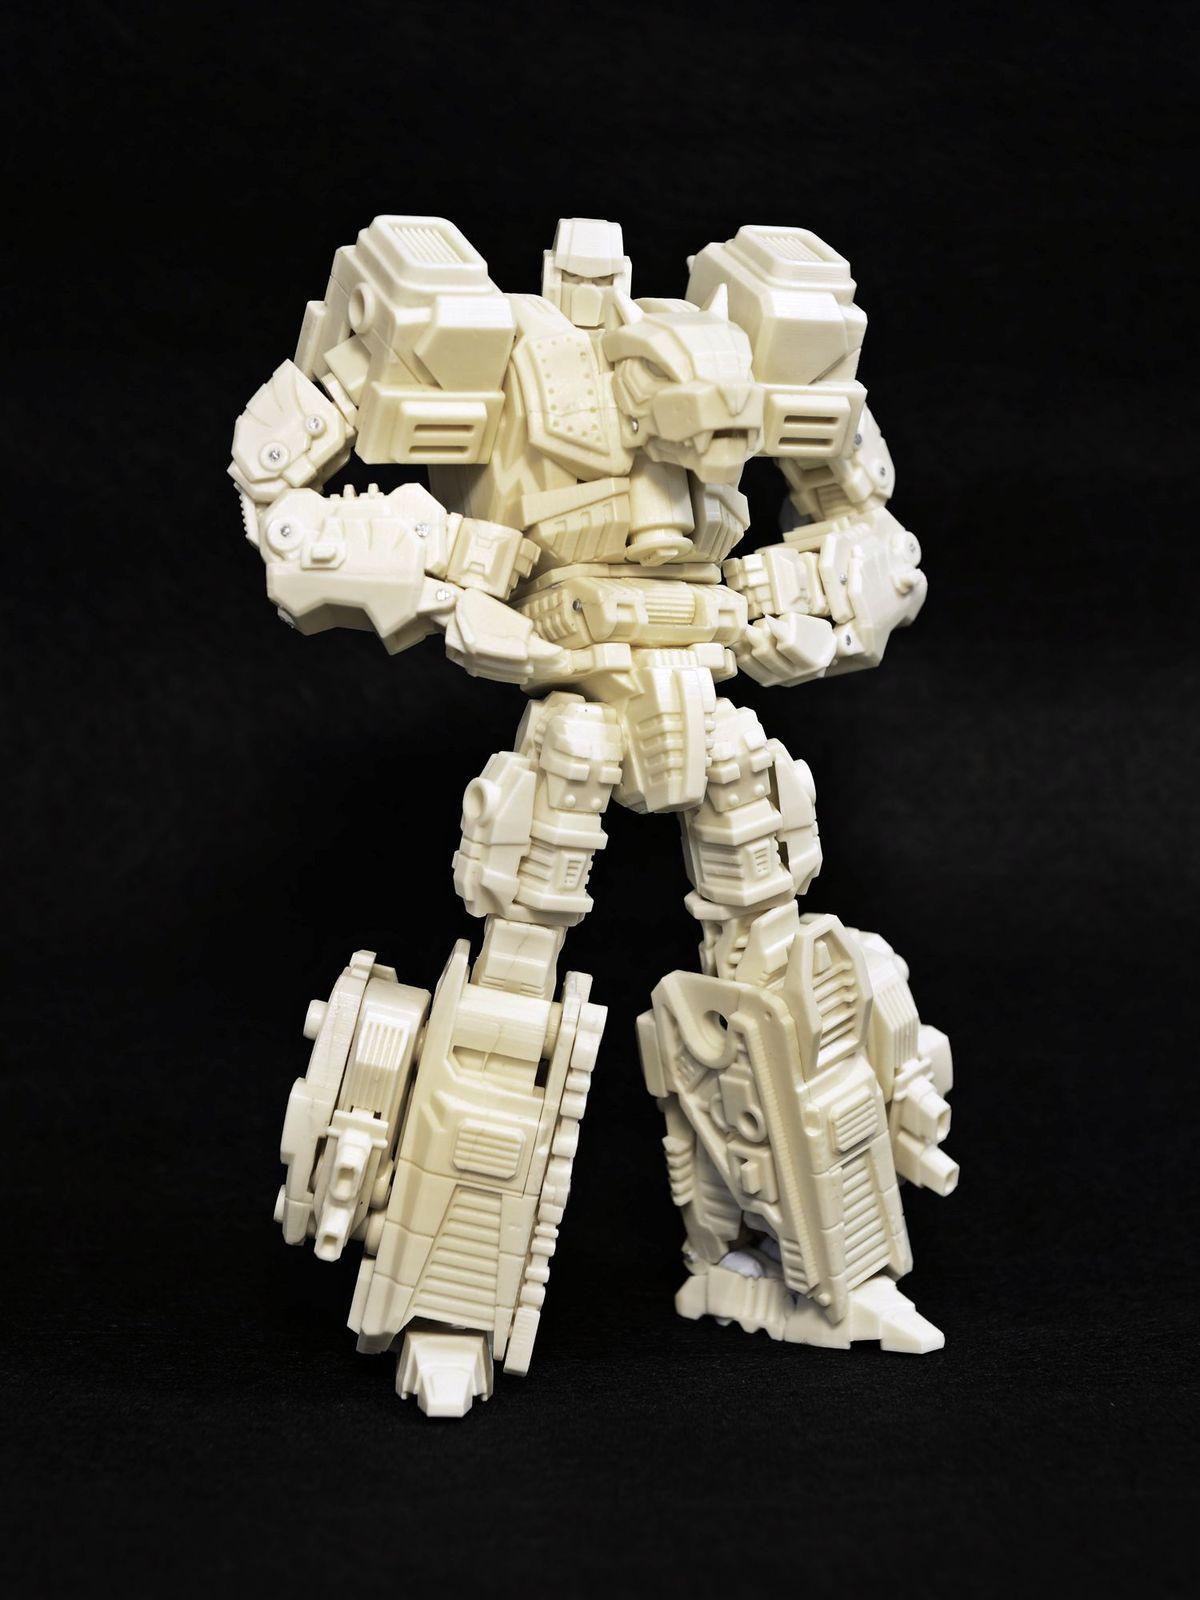 [Mastermind Creations] Produit Tiers - Feral Rex (aka Prédacons G1) + R-20N Nero Rex (aka Prédacons Noir) Tigris2_1368217259